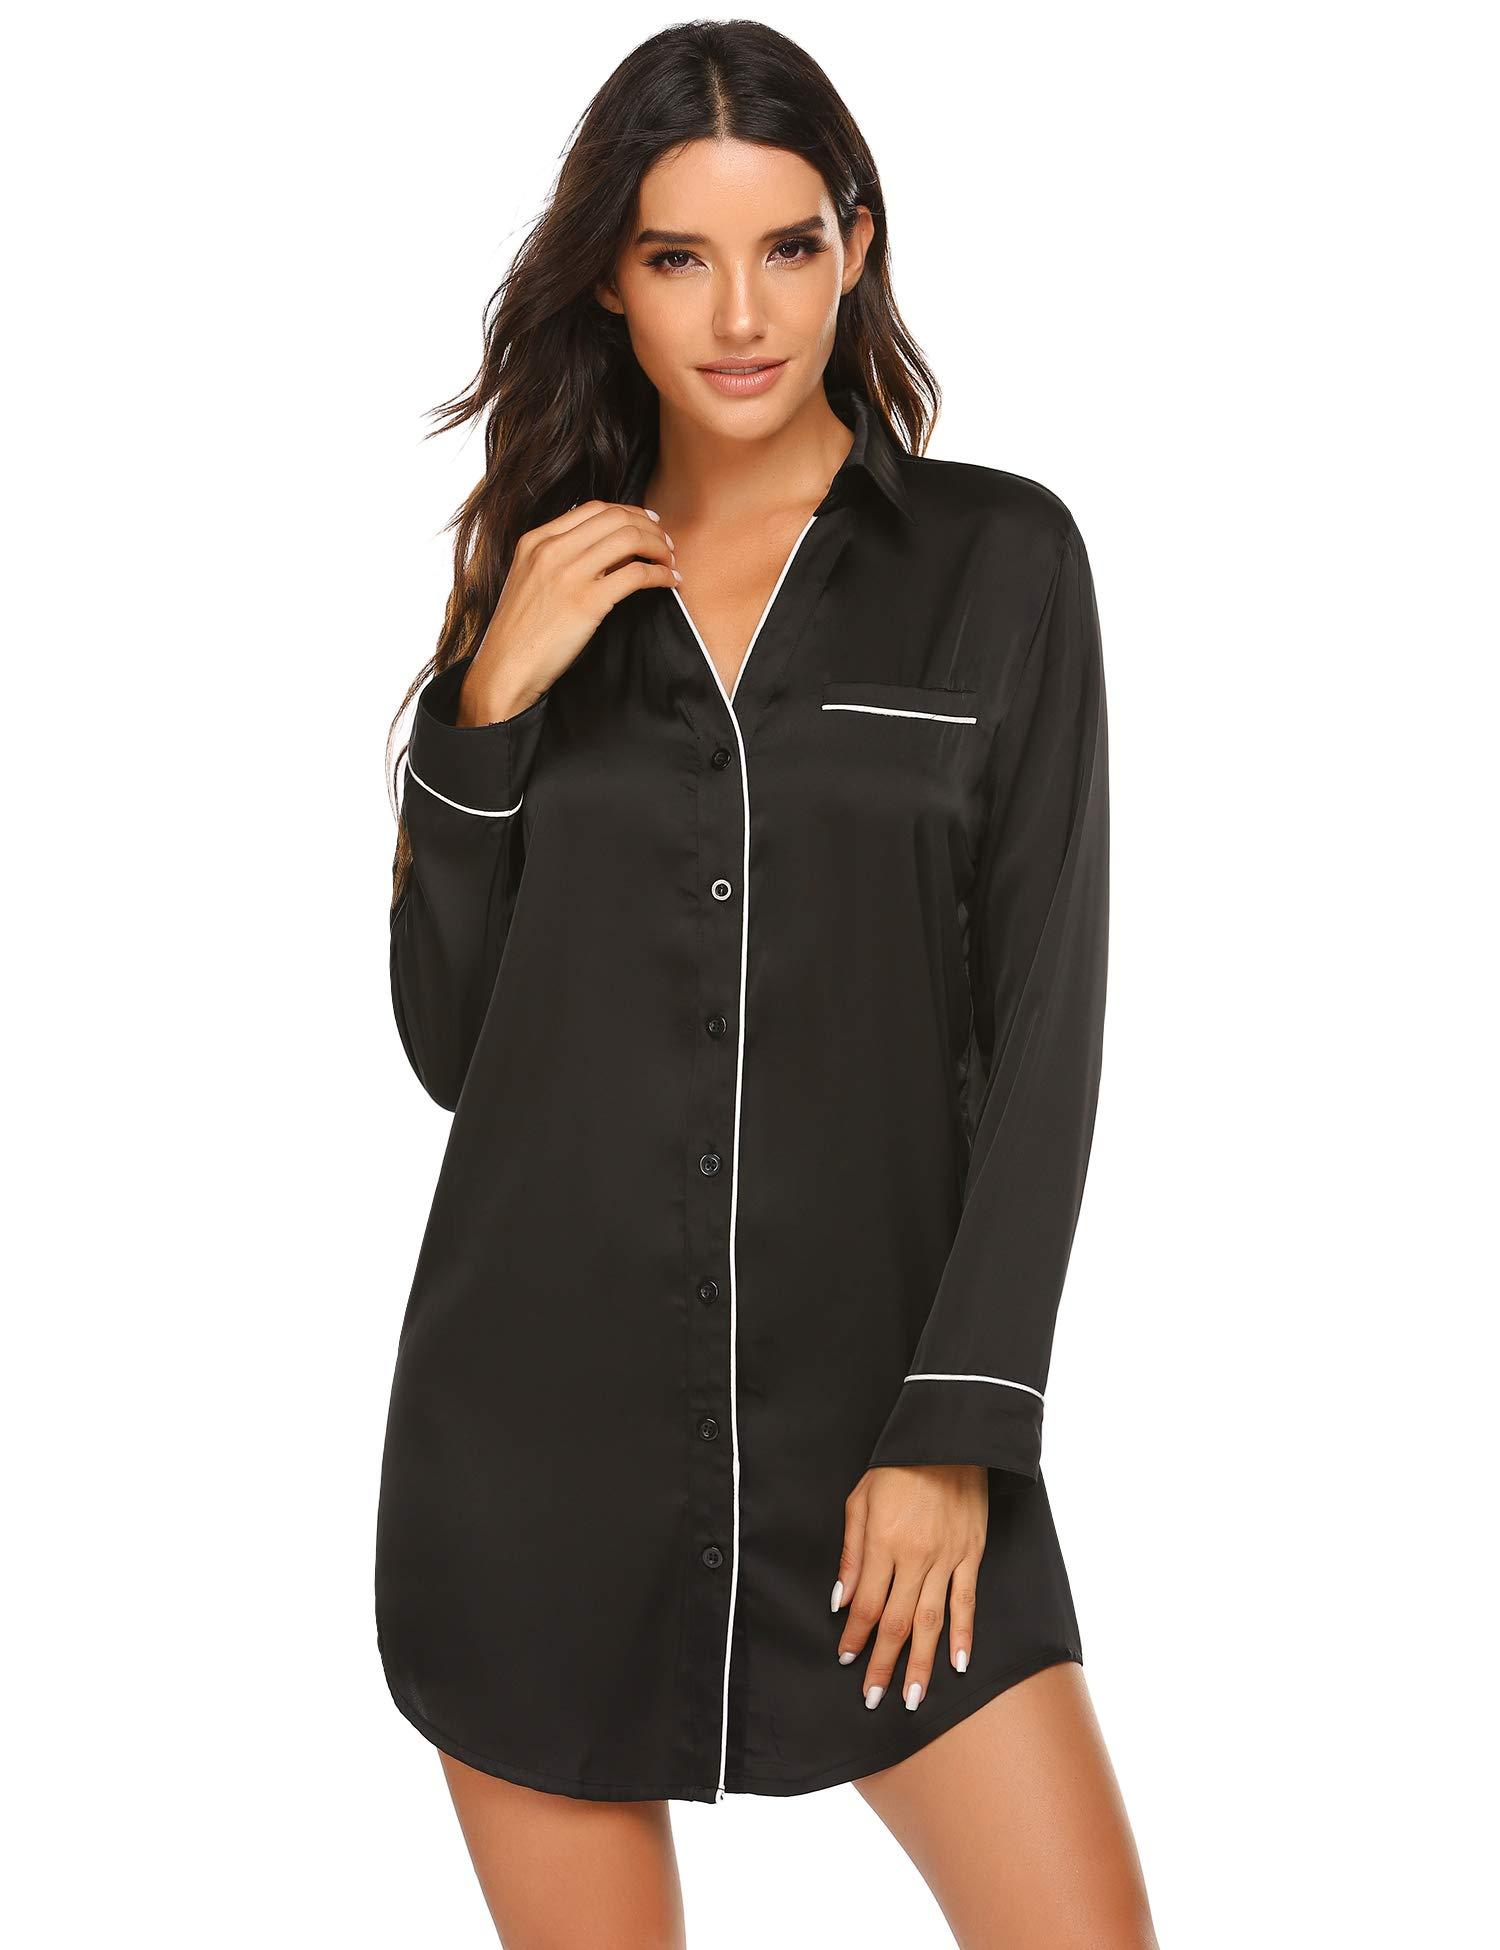 Ekouaer Sleepwear Long Sleeve Nightshirt Satin Sleepshirt Button Front Pajama Top for Women